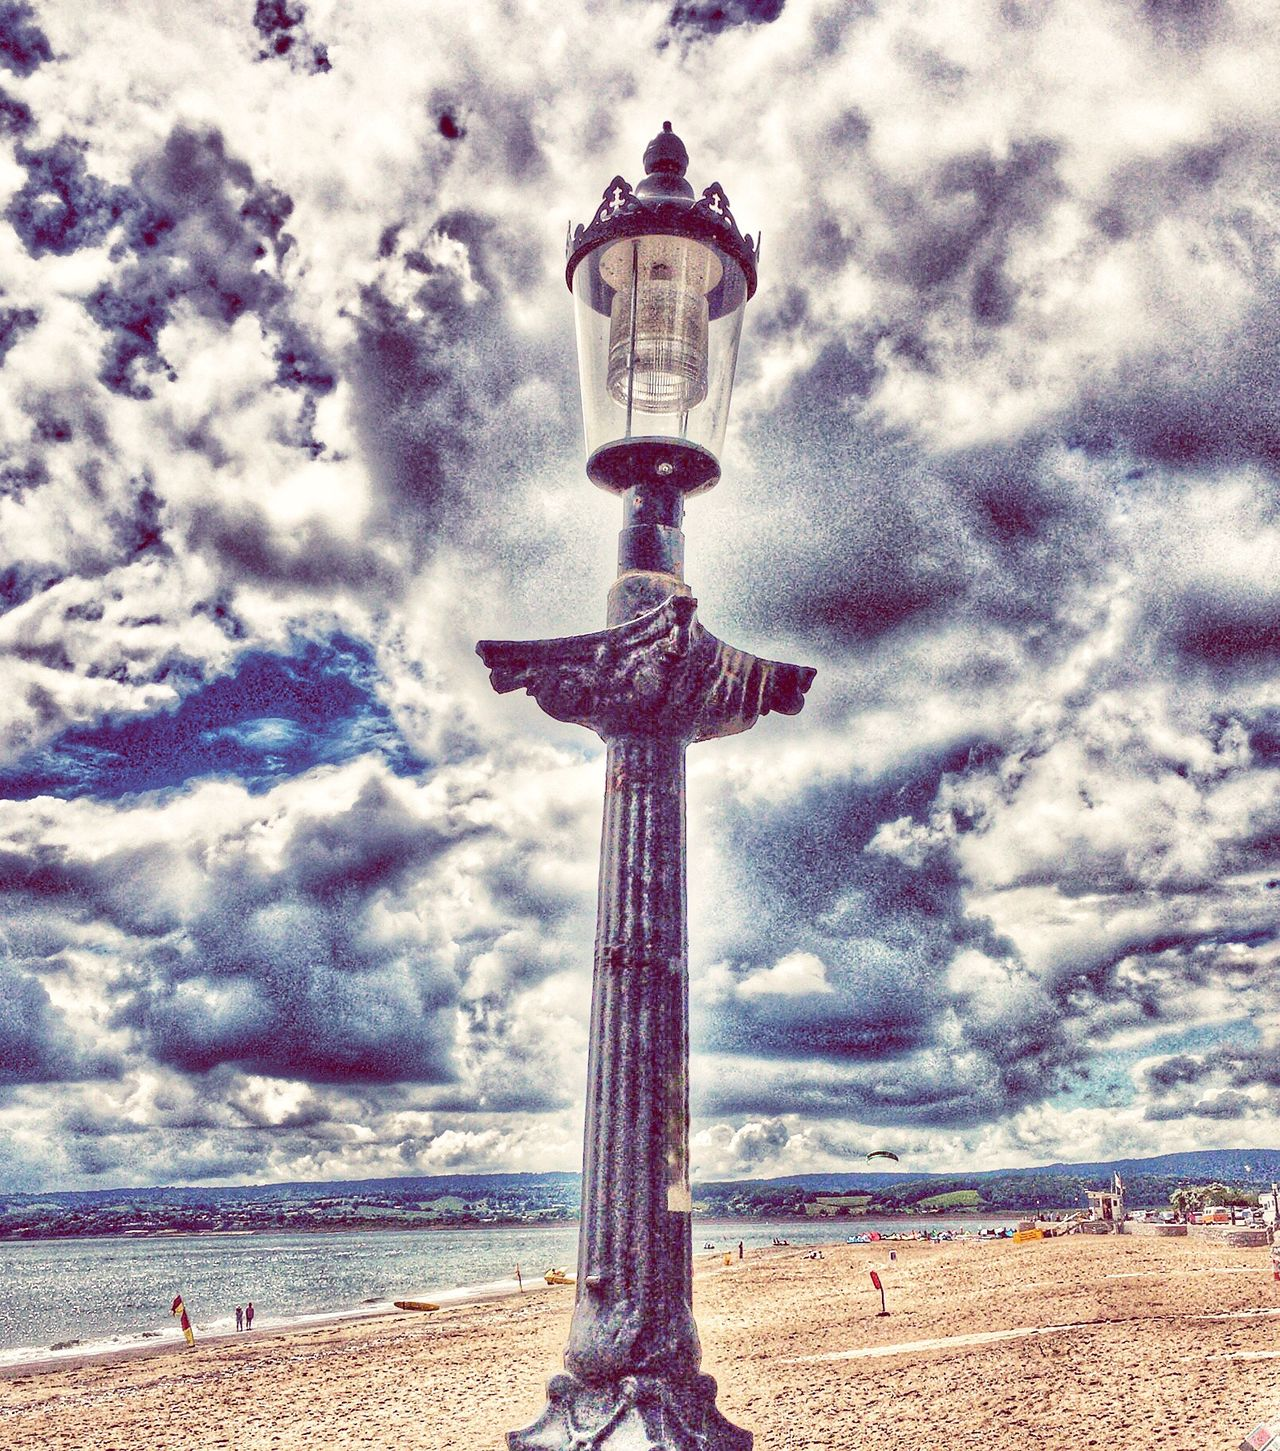 Lampost Lighting Up The Sky Surreal Ironmongery Narnia